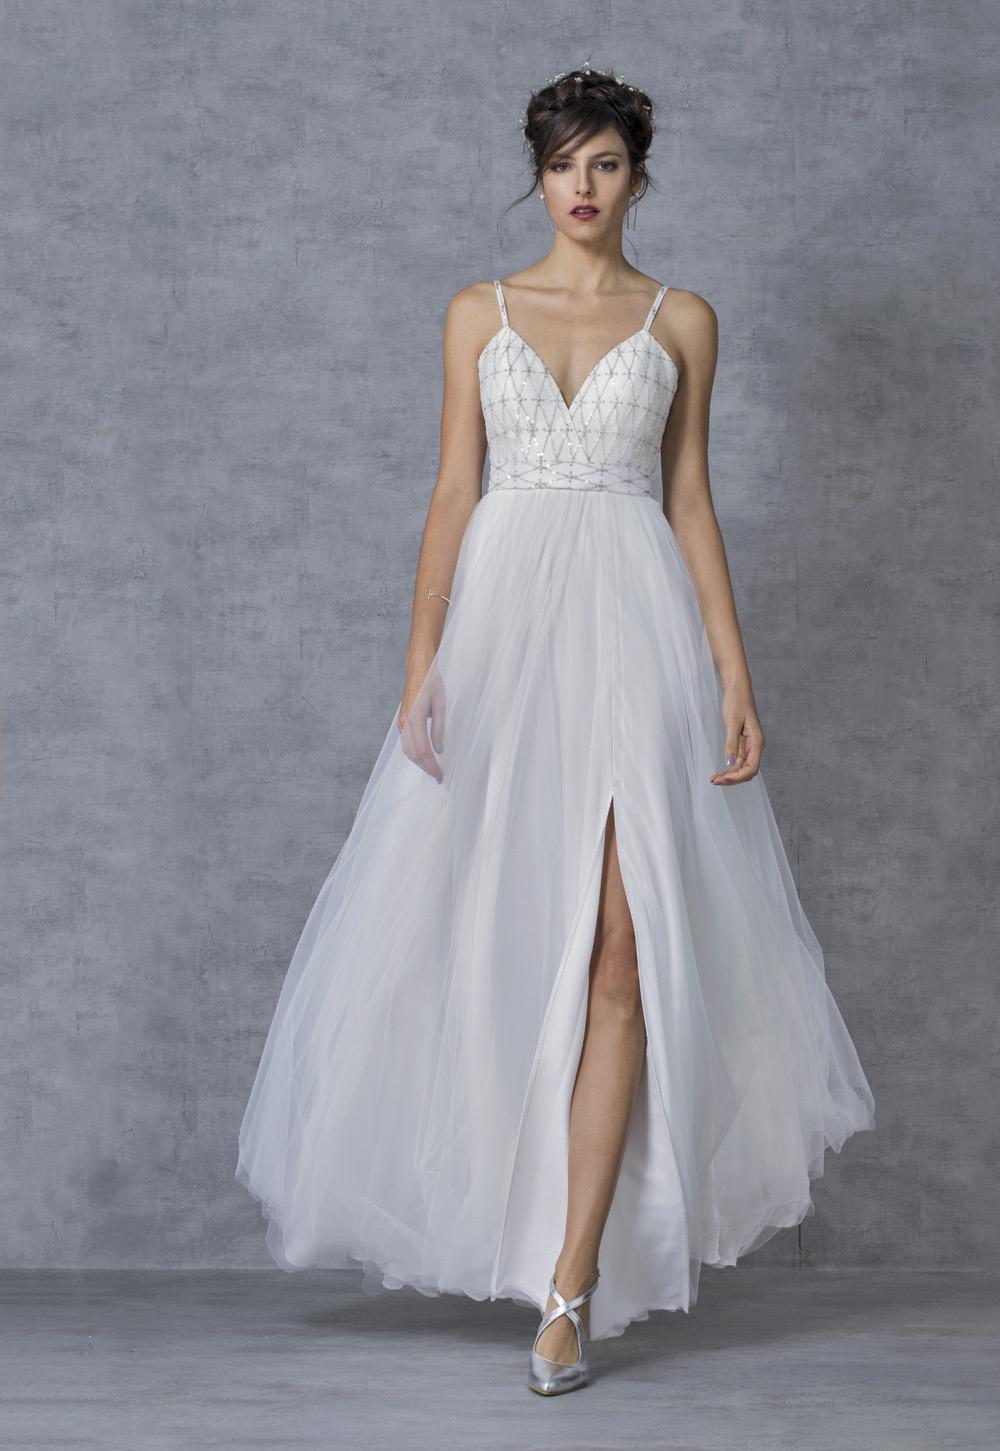 I3A8672 שמלות כלה - שמלה